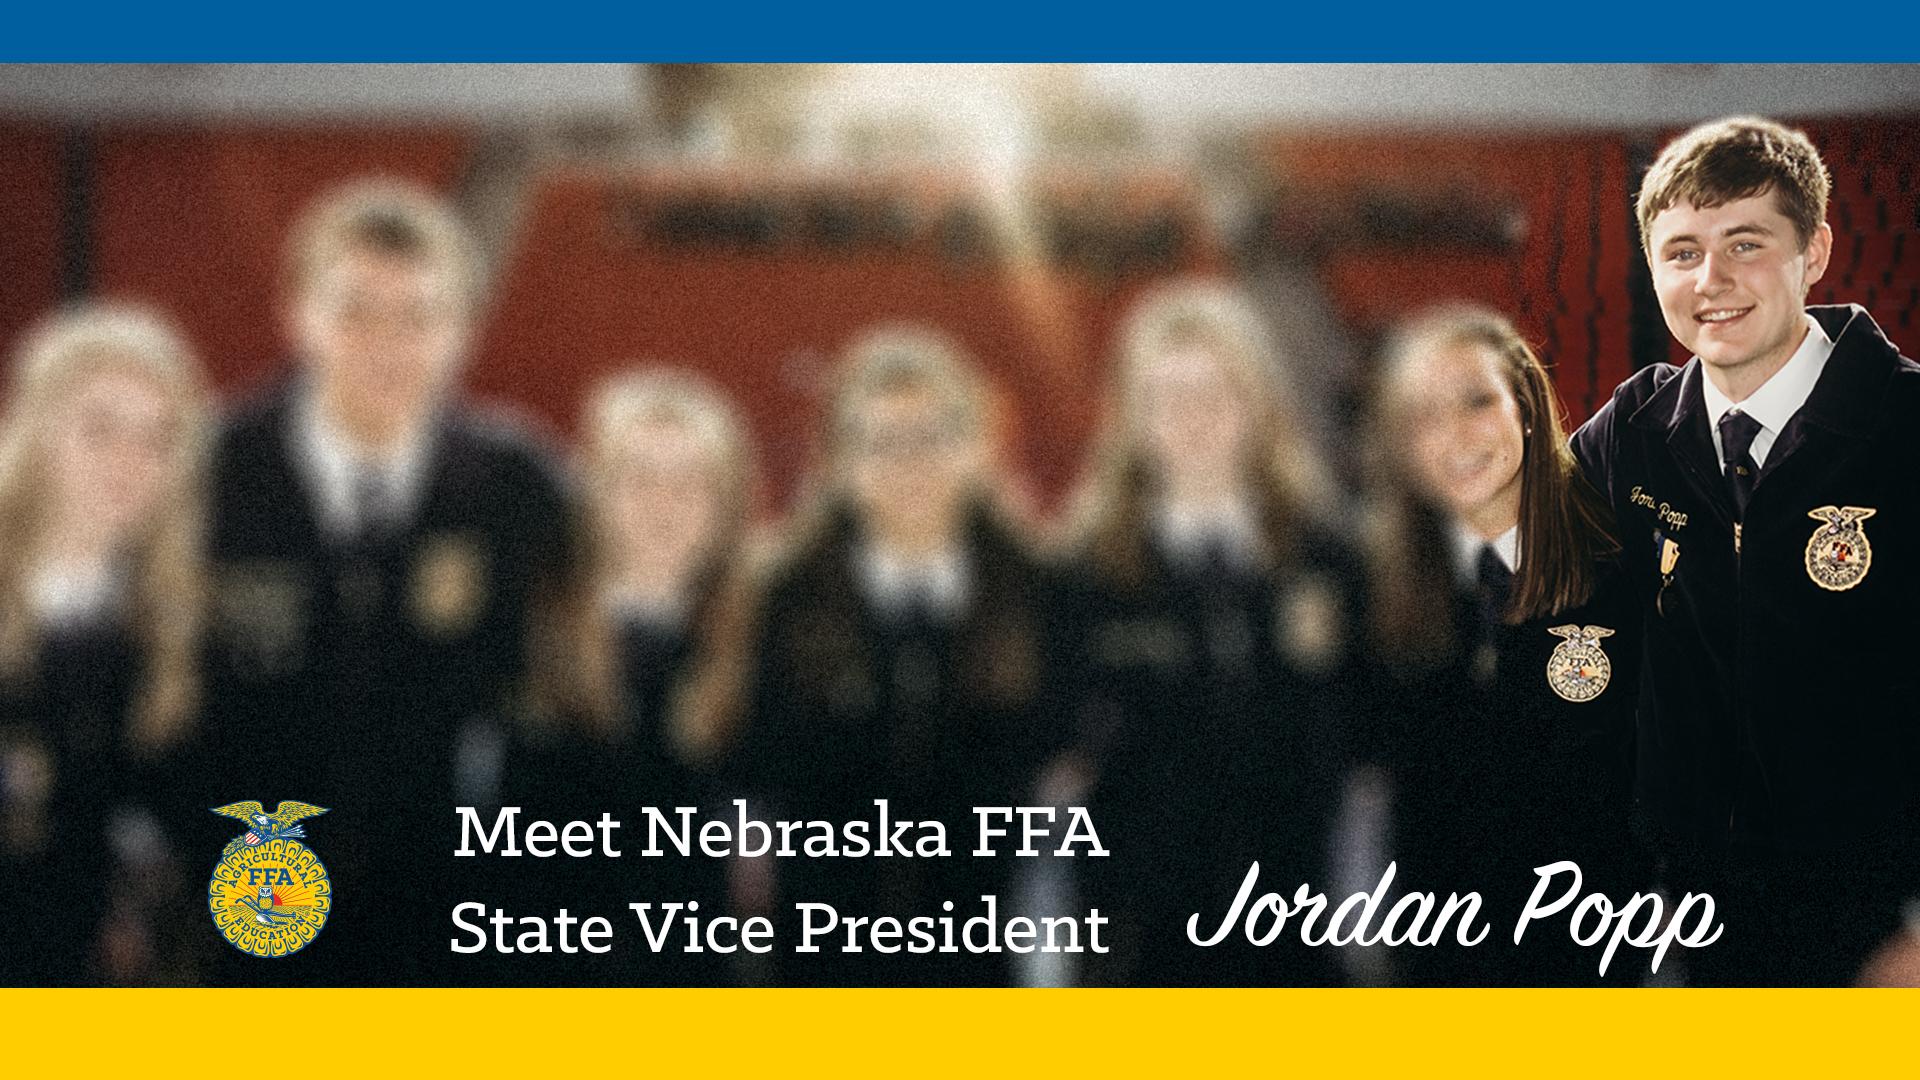 Meet Your 2018-19 Nebraska FFA State Vice President: Jordan Popp